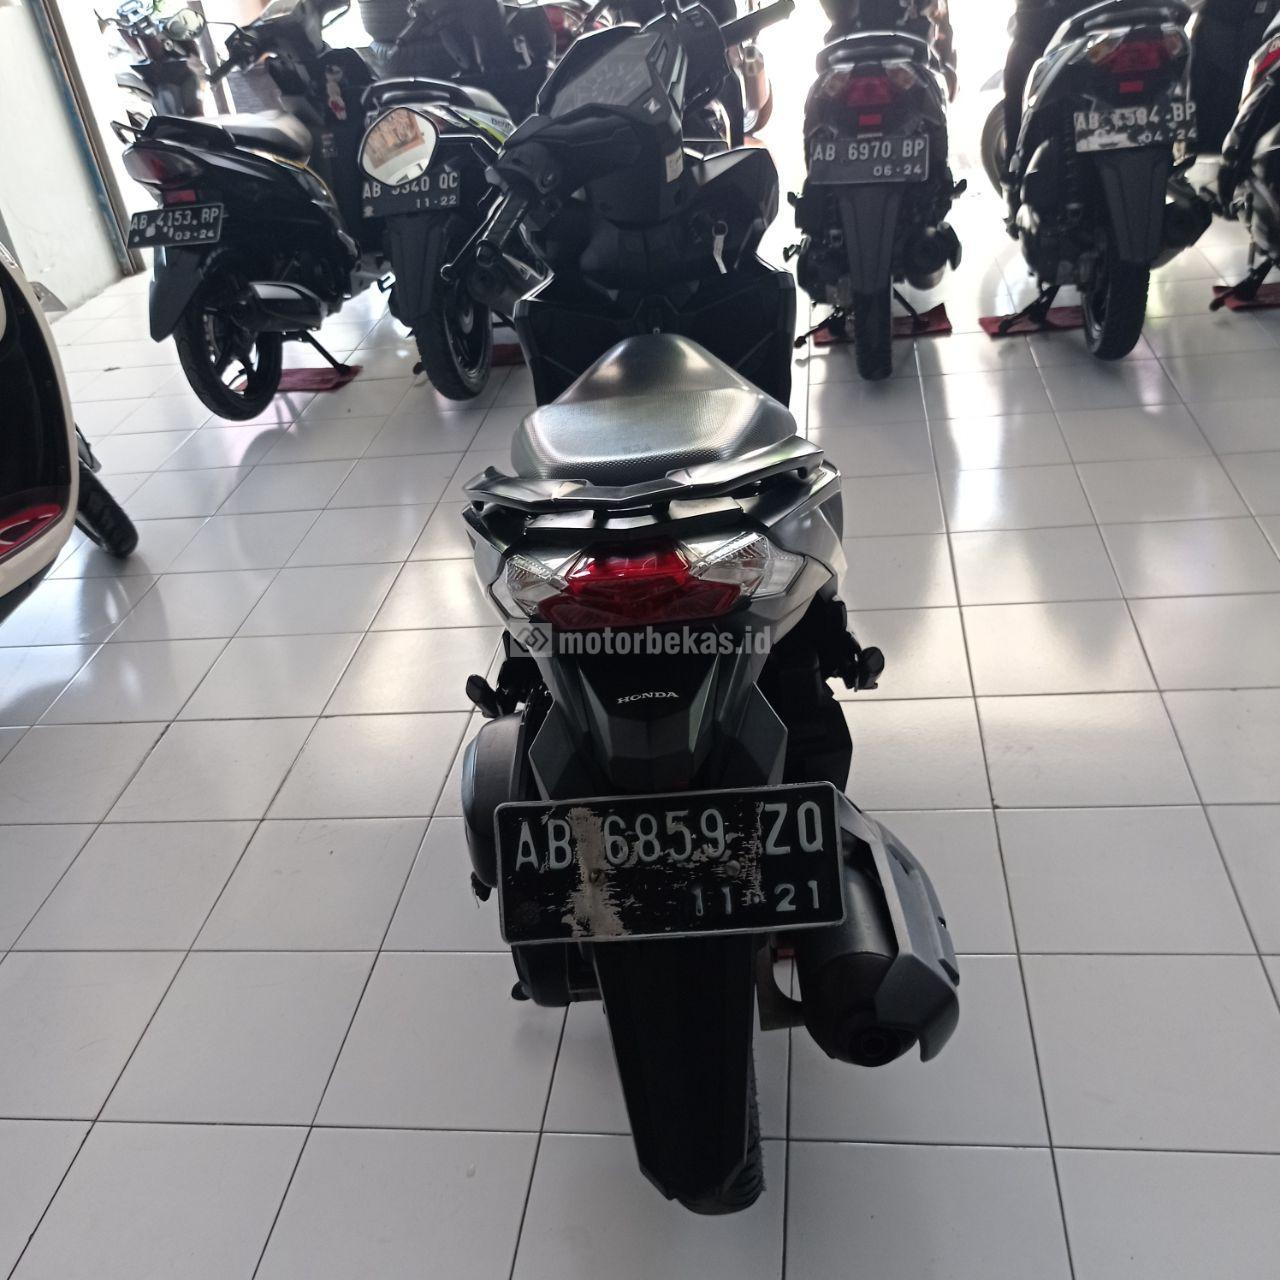 HONDA VARIO 150  416 motorbekas.id